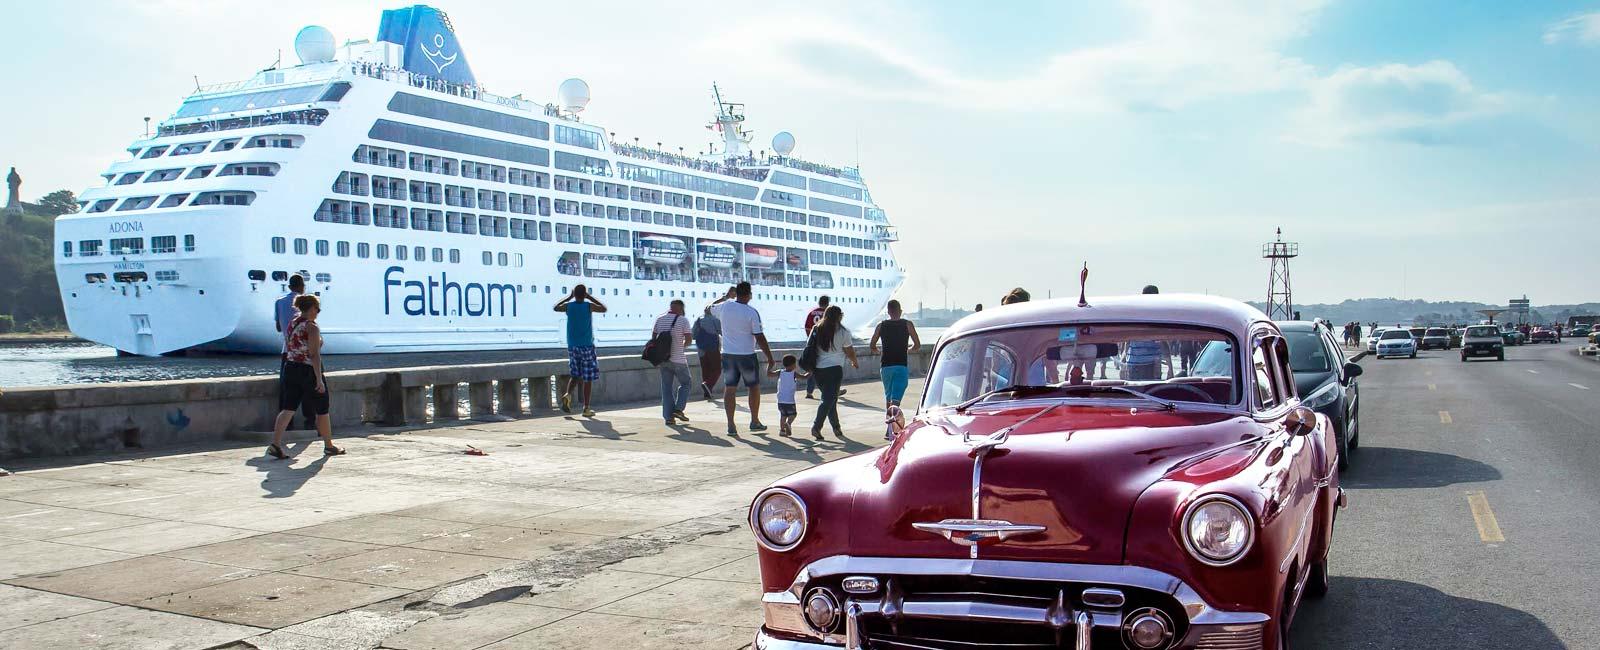 Image result for Fathom cruise cuba